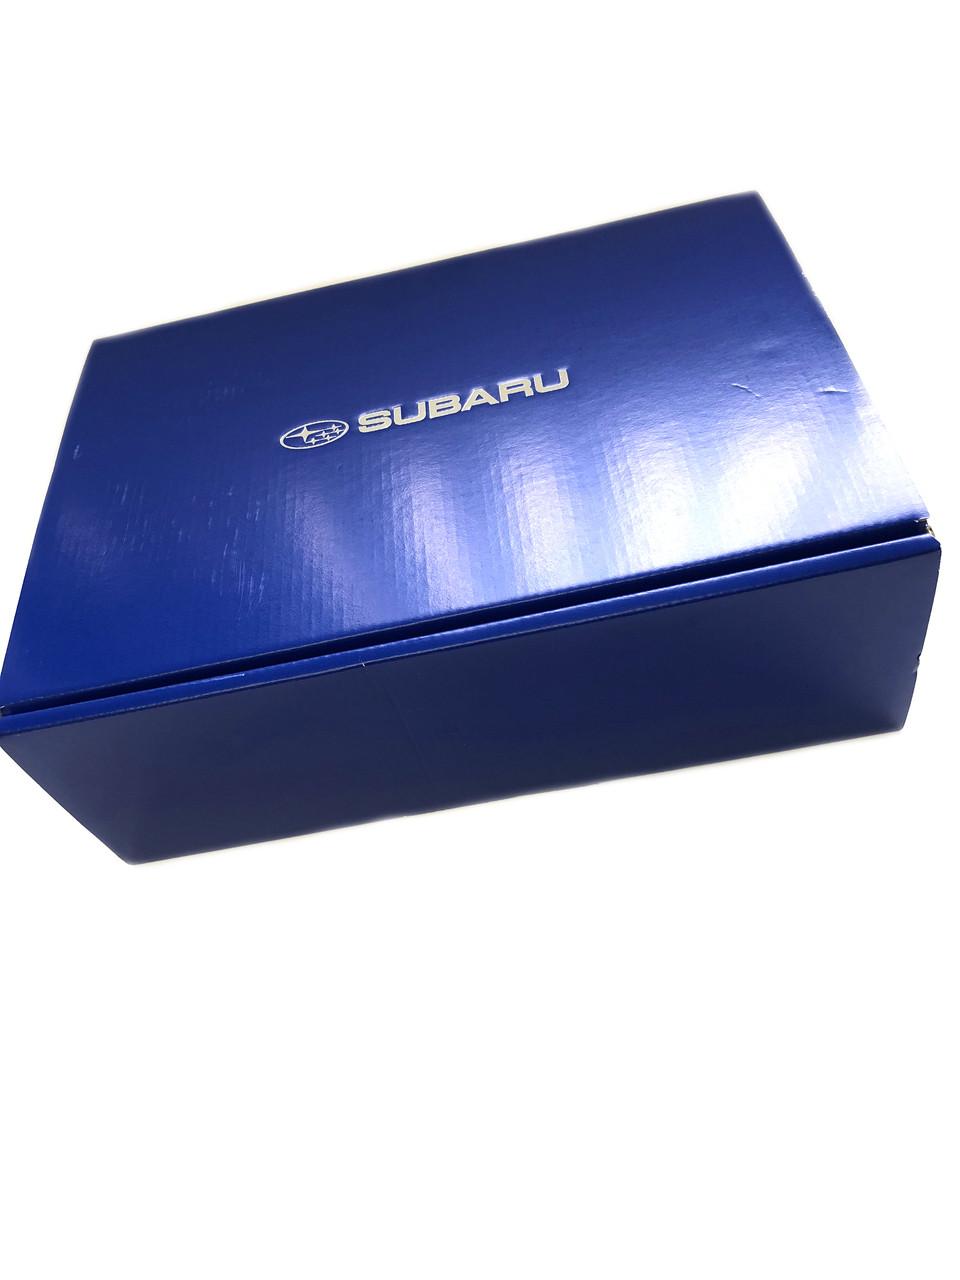 Subaru tea cup set presentation box at AVOJDM.com